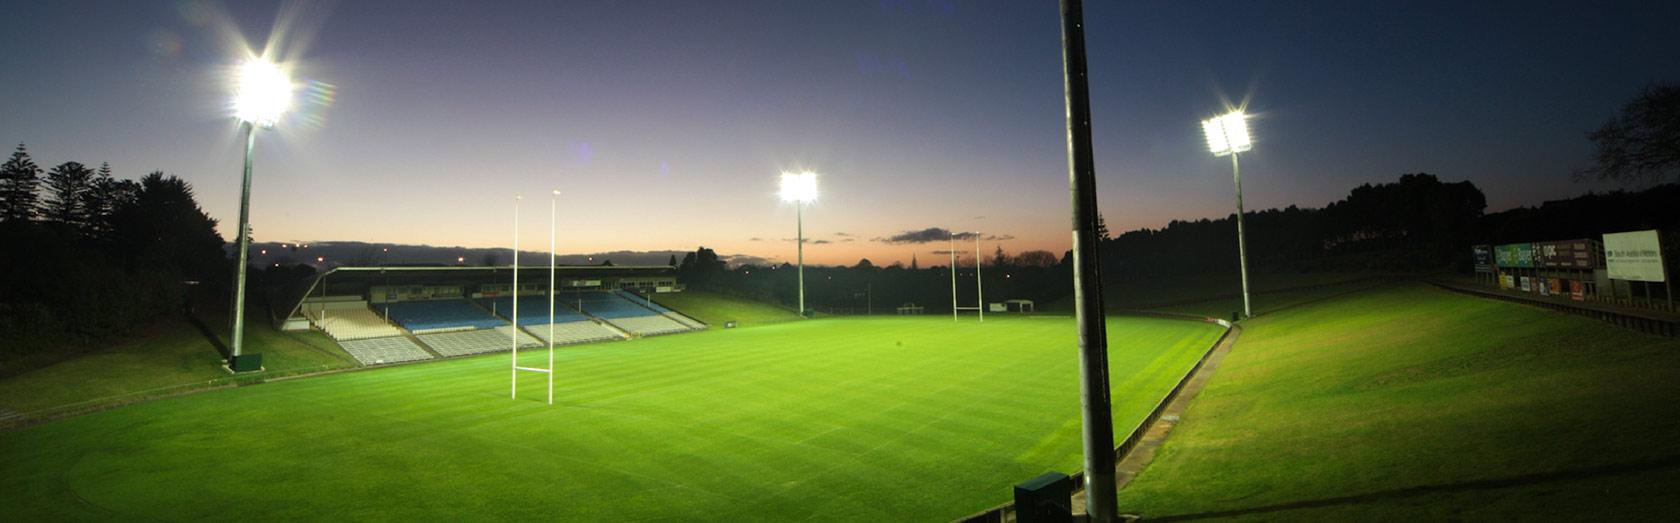 racecourse-and-stadium-slider